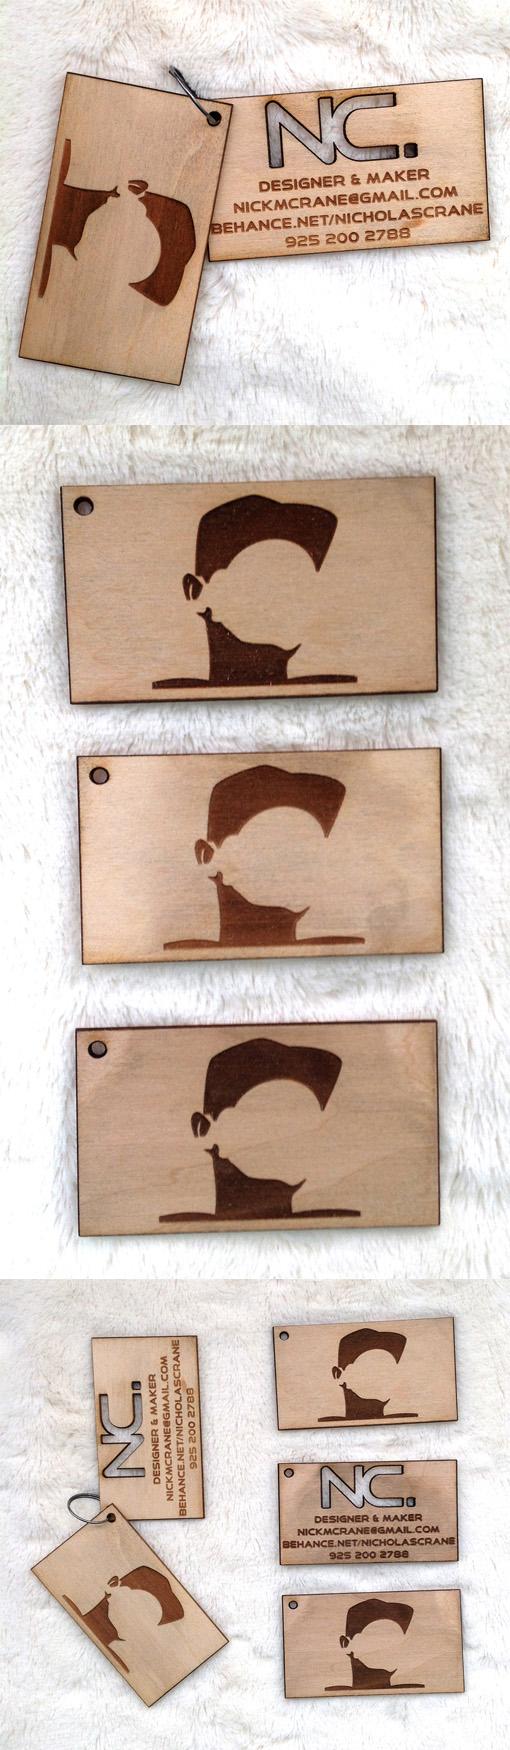 Laser Cut And Etched Wooden Business Card Design For A Designer